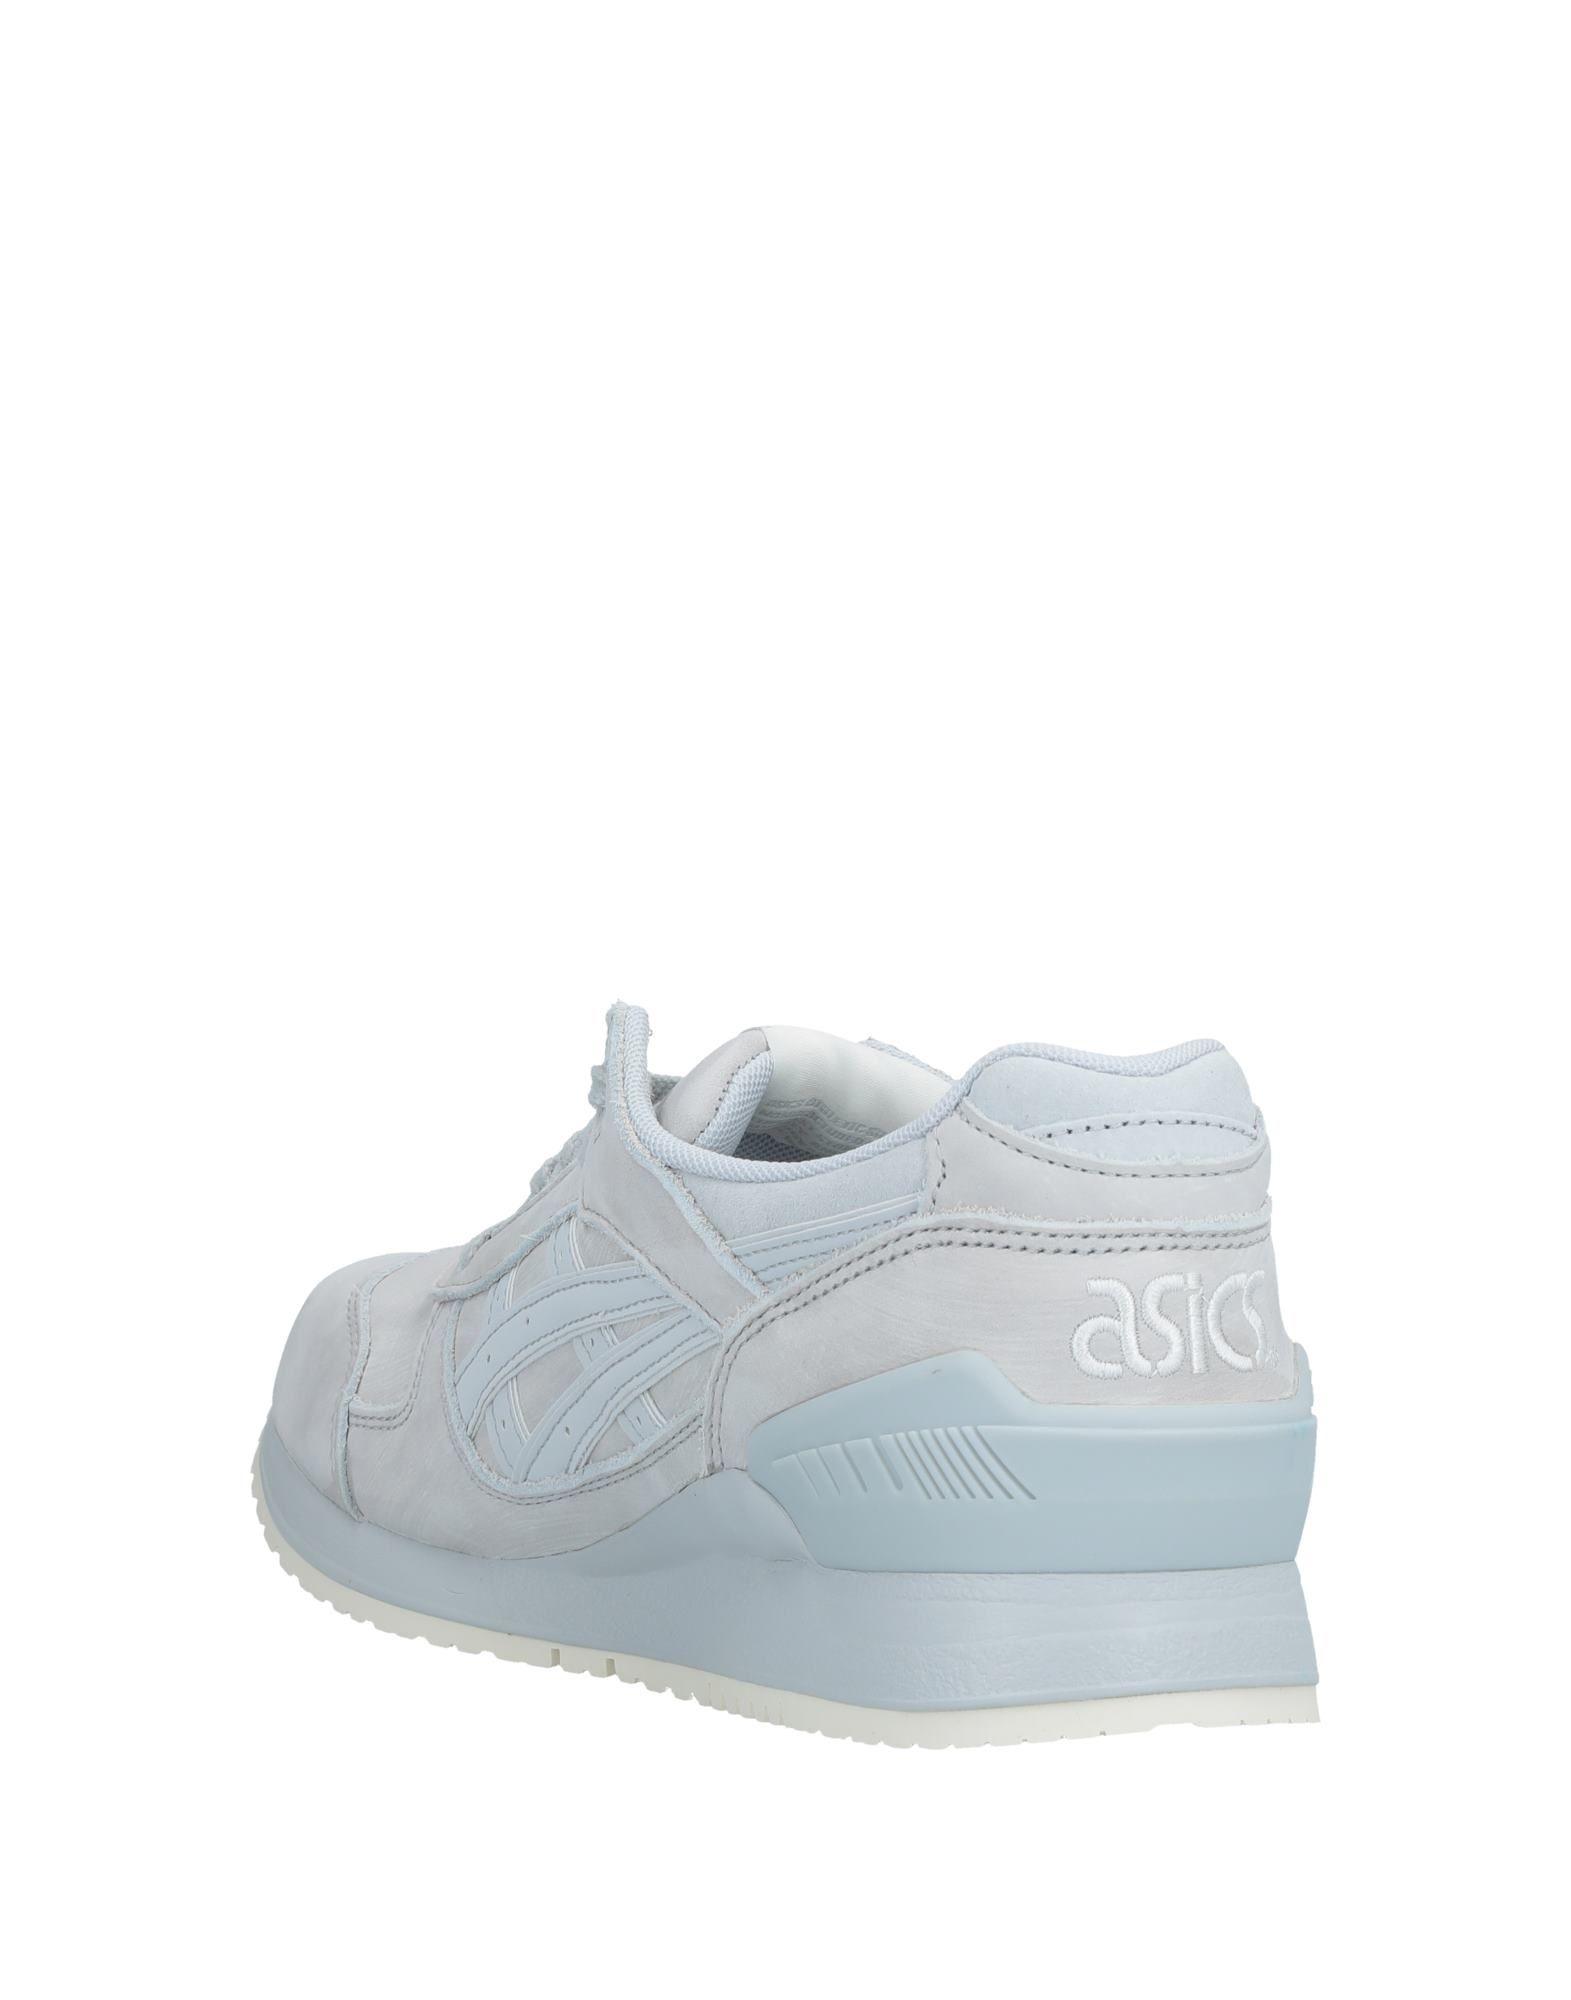 Rabatt Tiger echte Schuhe Asics Tiger Rabatt Sneakers Herren  11535701IB 256e1e